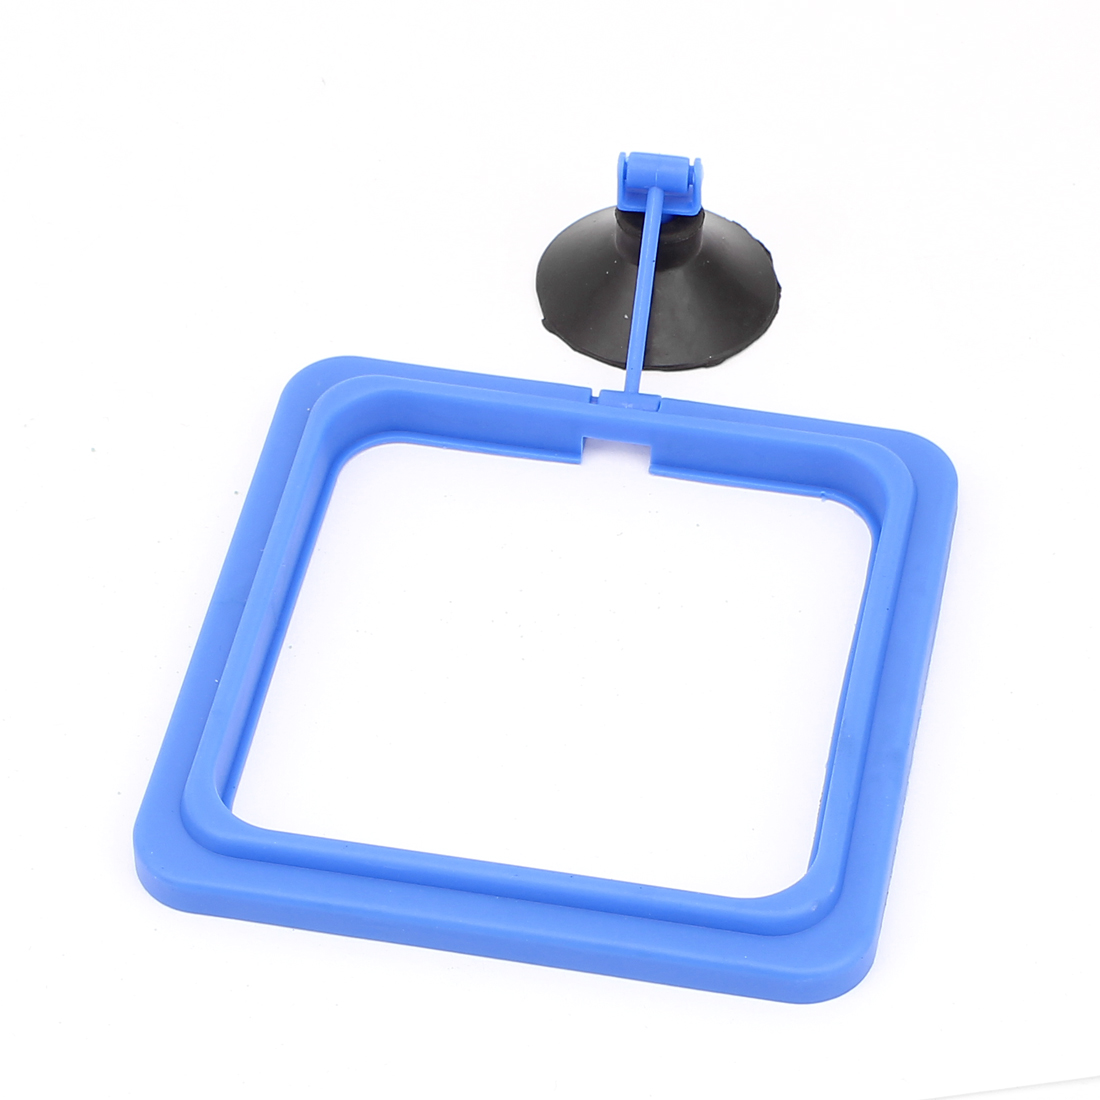 Adjustable Suction Cup Aquarium Fish Tank Food Feeder Feeding Ring Black Blue